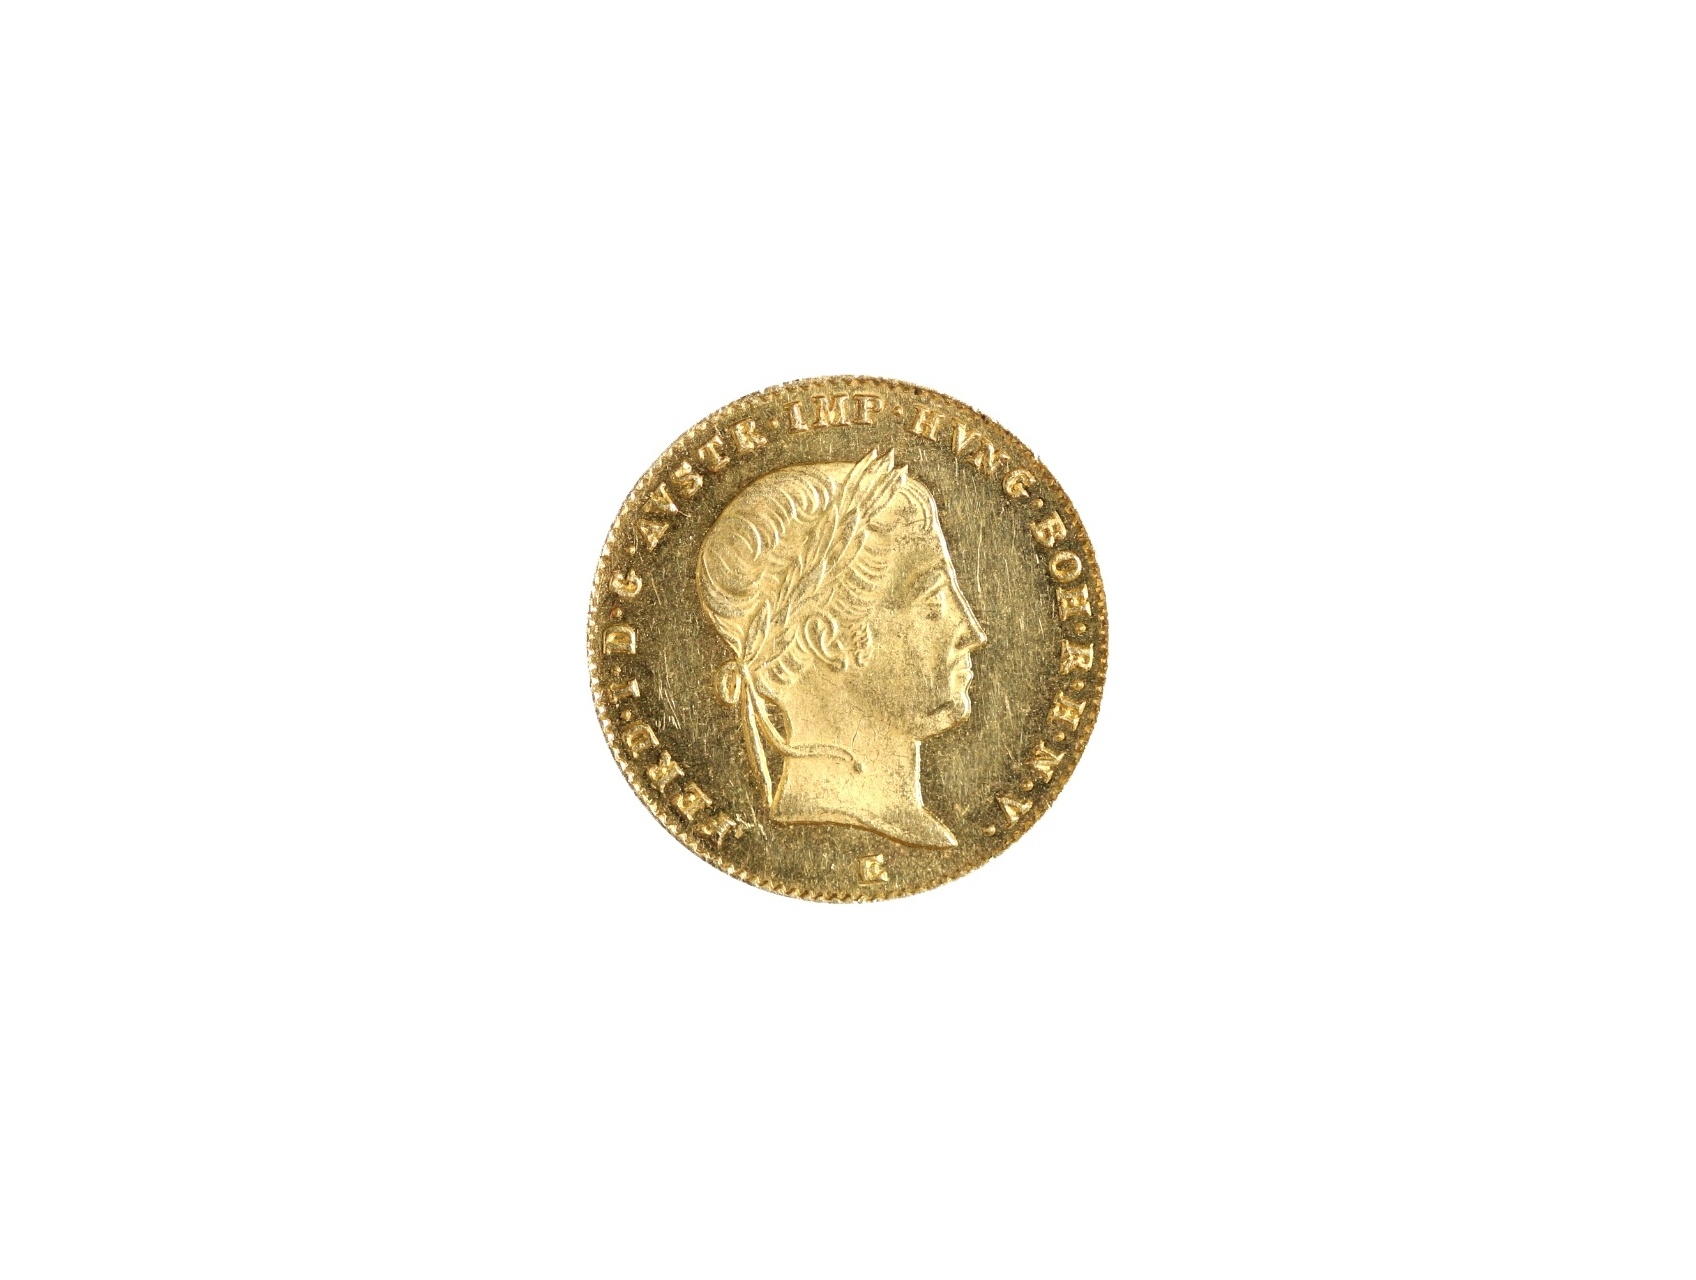 Ferdinand V. 1835-1848 - Dukát 1847 E, N44